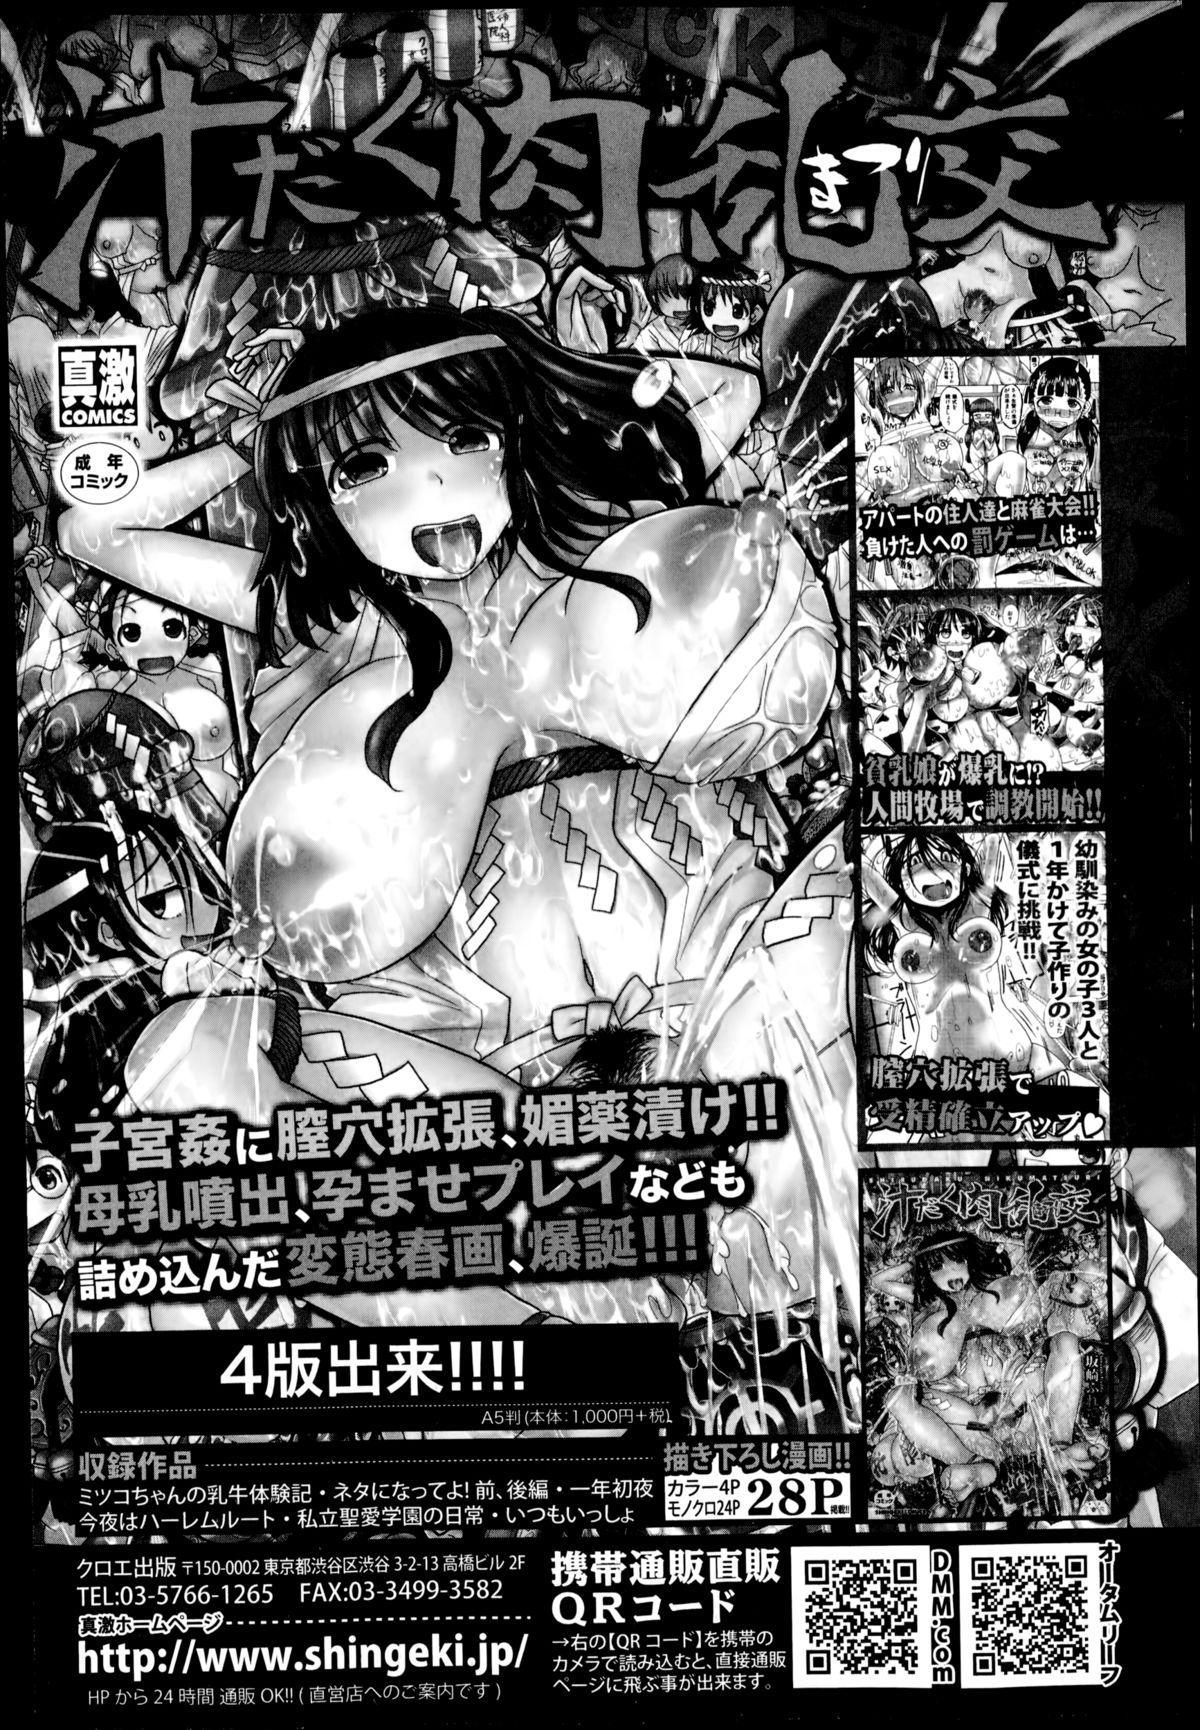 COMIC Shingeki 2014-12 163